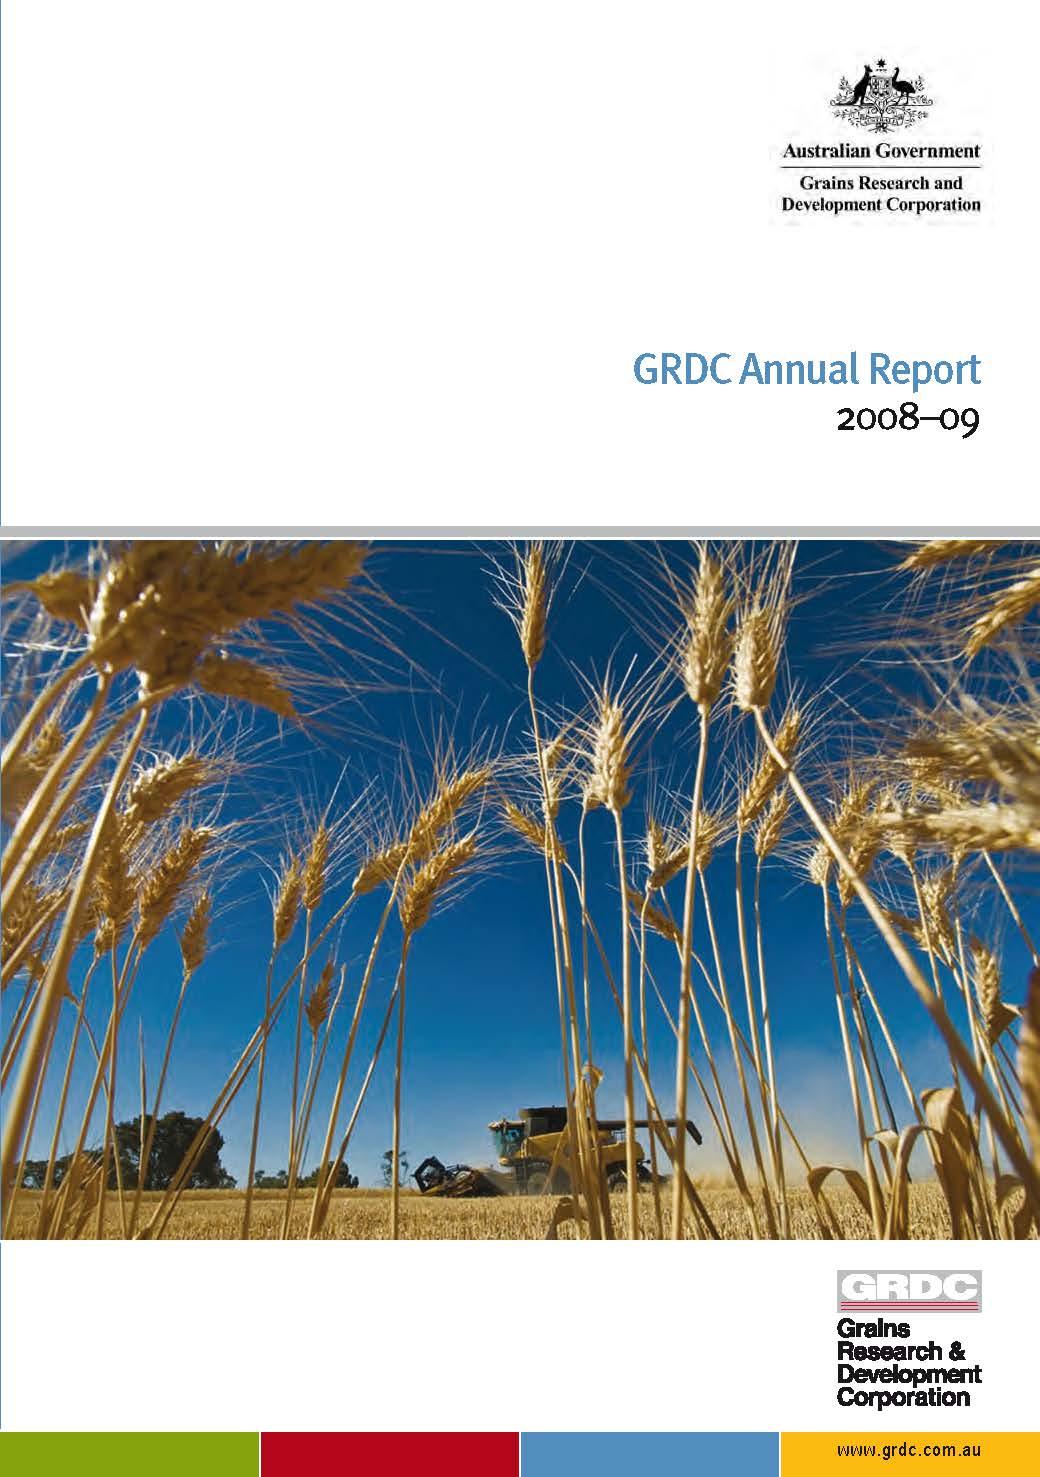 GRDC Annual Report 2008-09 cover